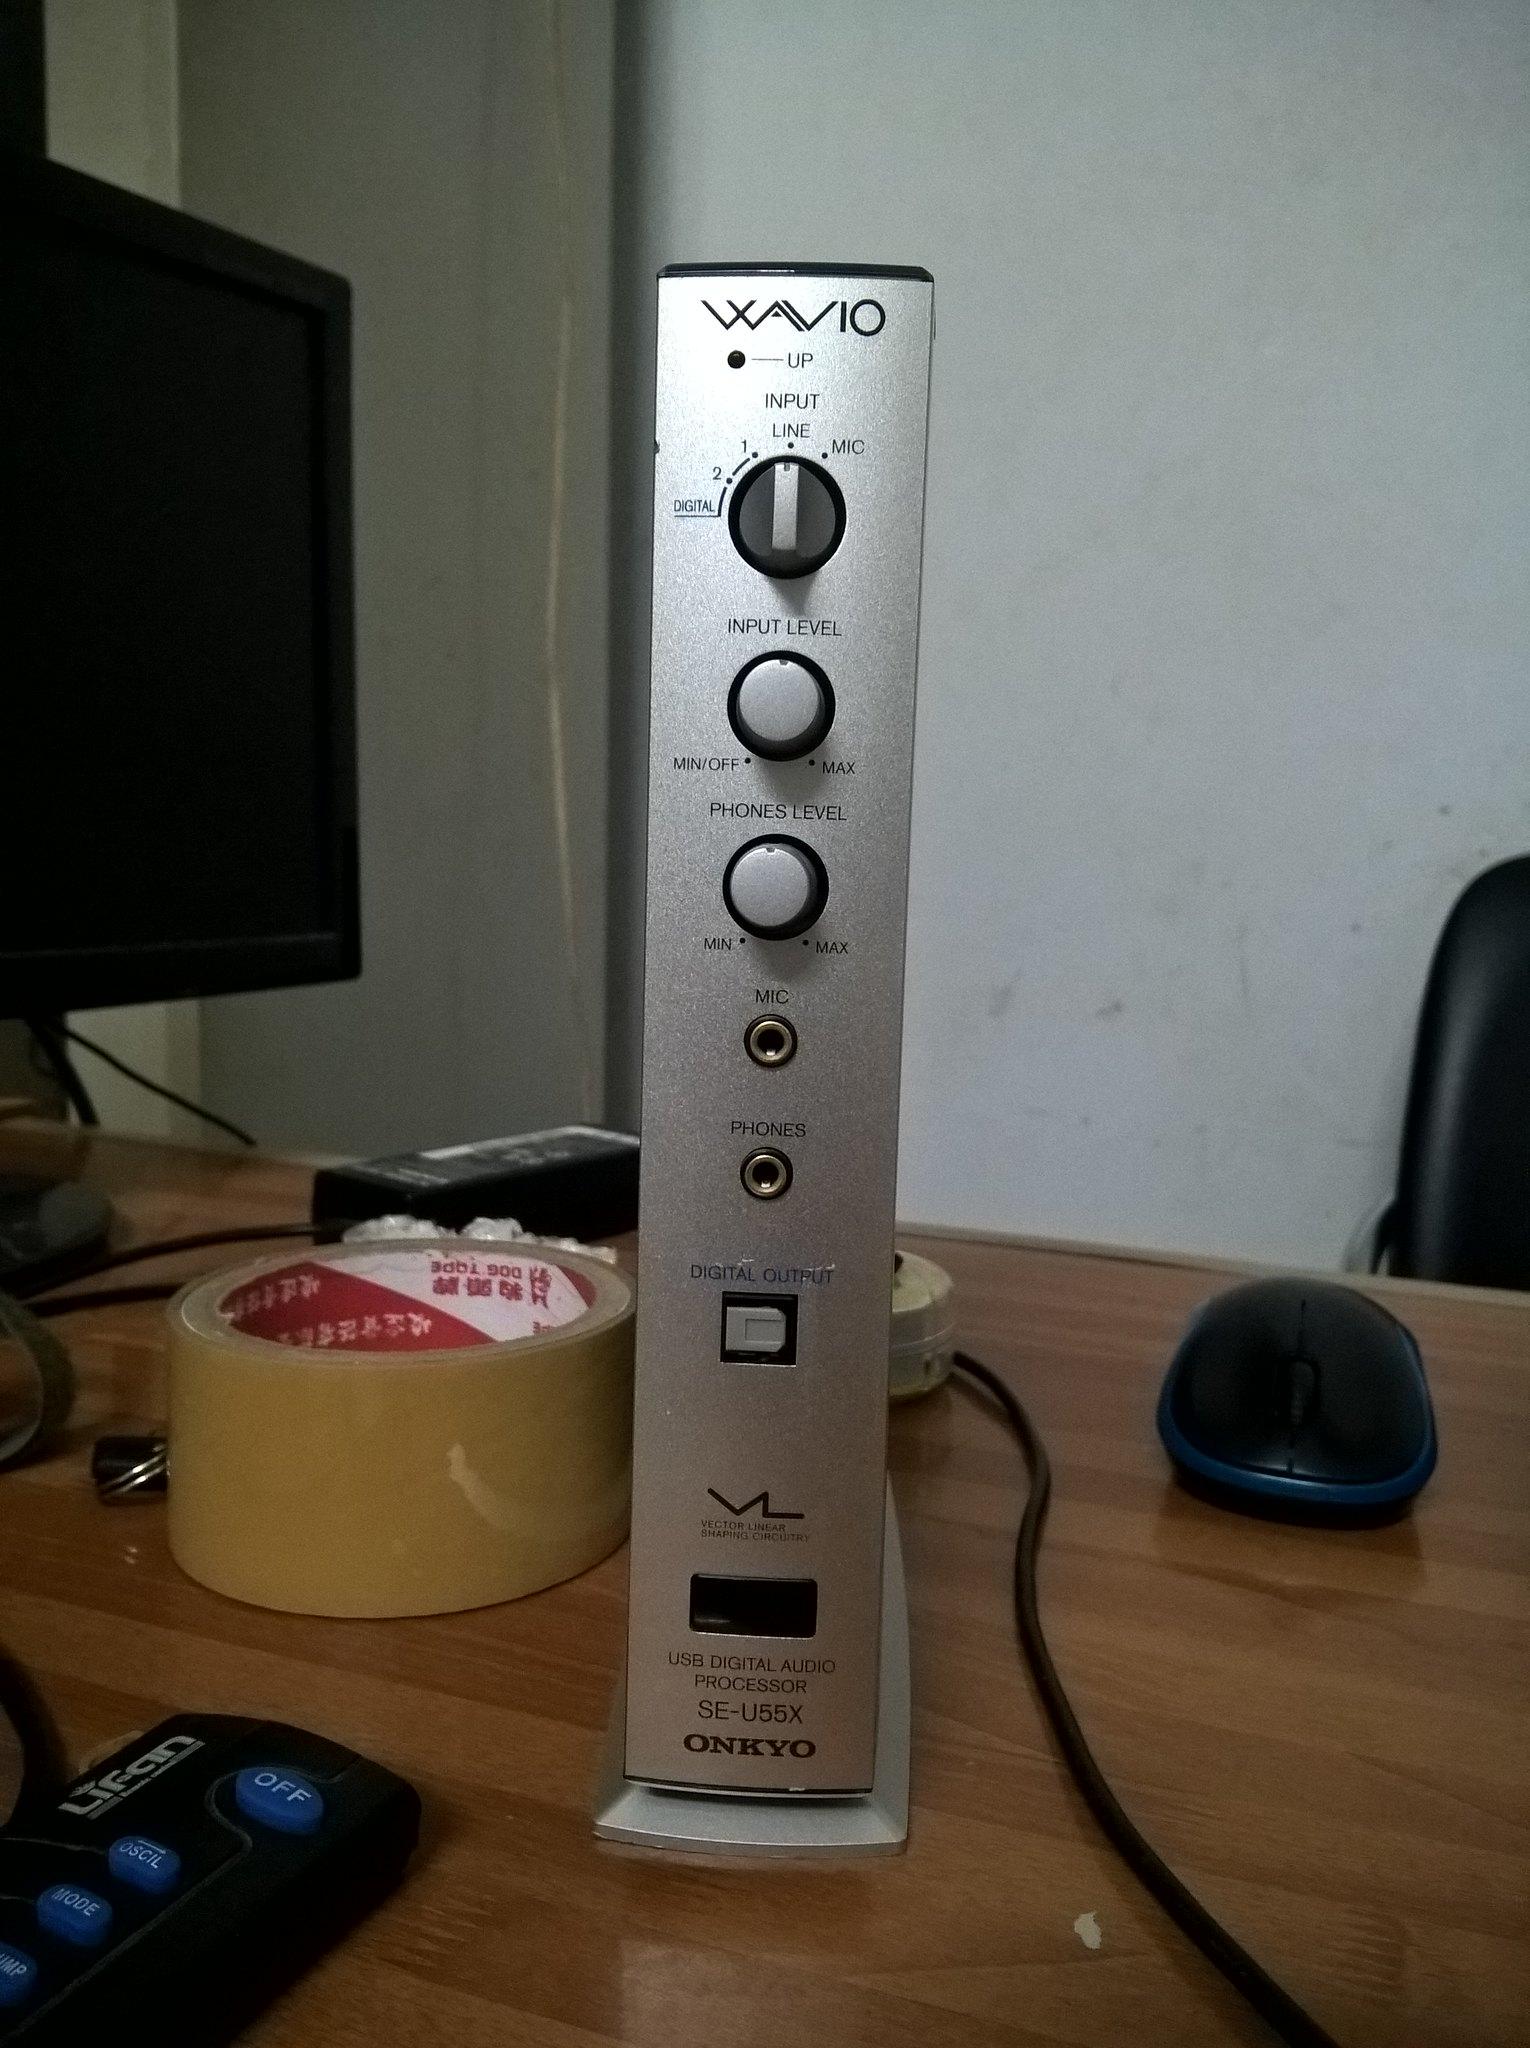 Onkyo từ Japan - U55SX, U55SX2, 200PCI LTD, 200PCI, 150PCI, 90PCI - 14